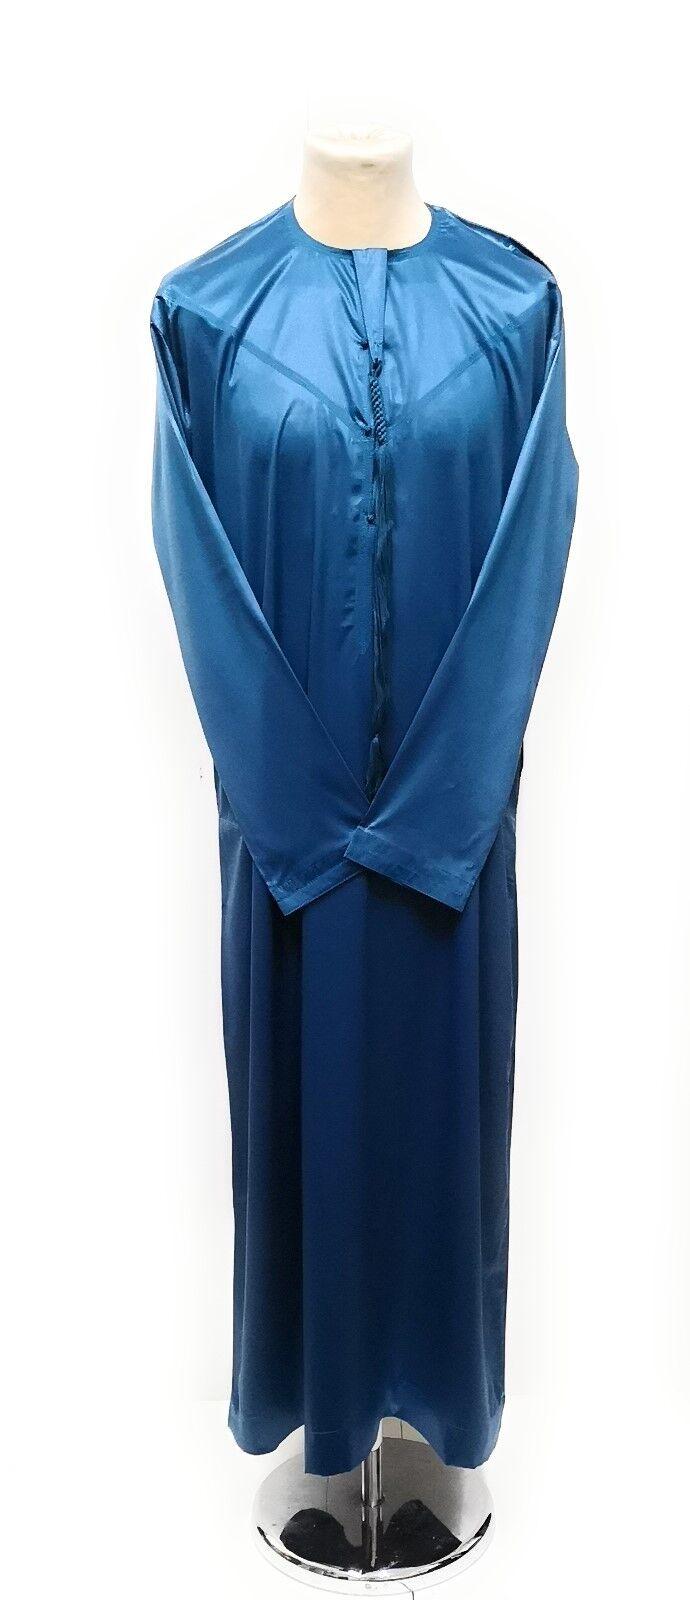 Sizes 52 To 62 Men Exclusivo Emaratee.emarati   Omani Thobe